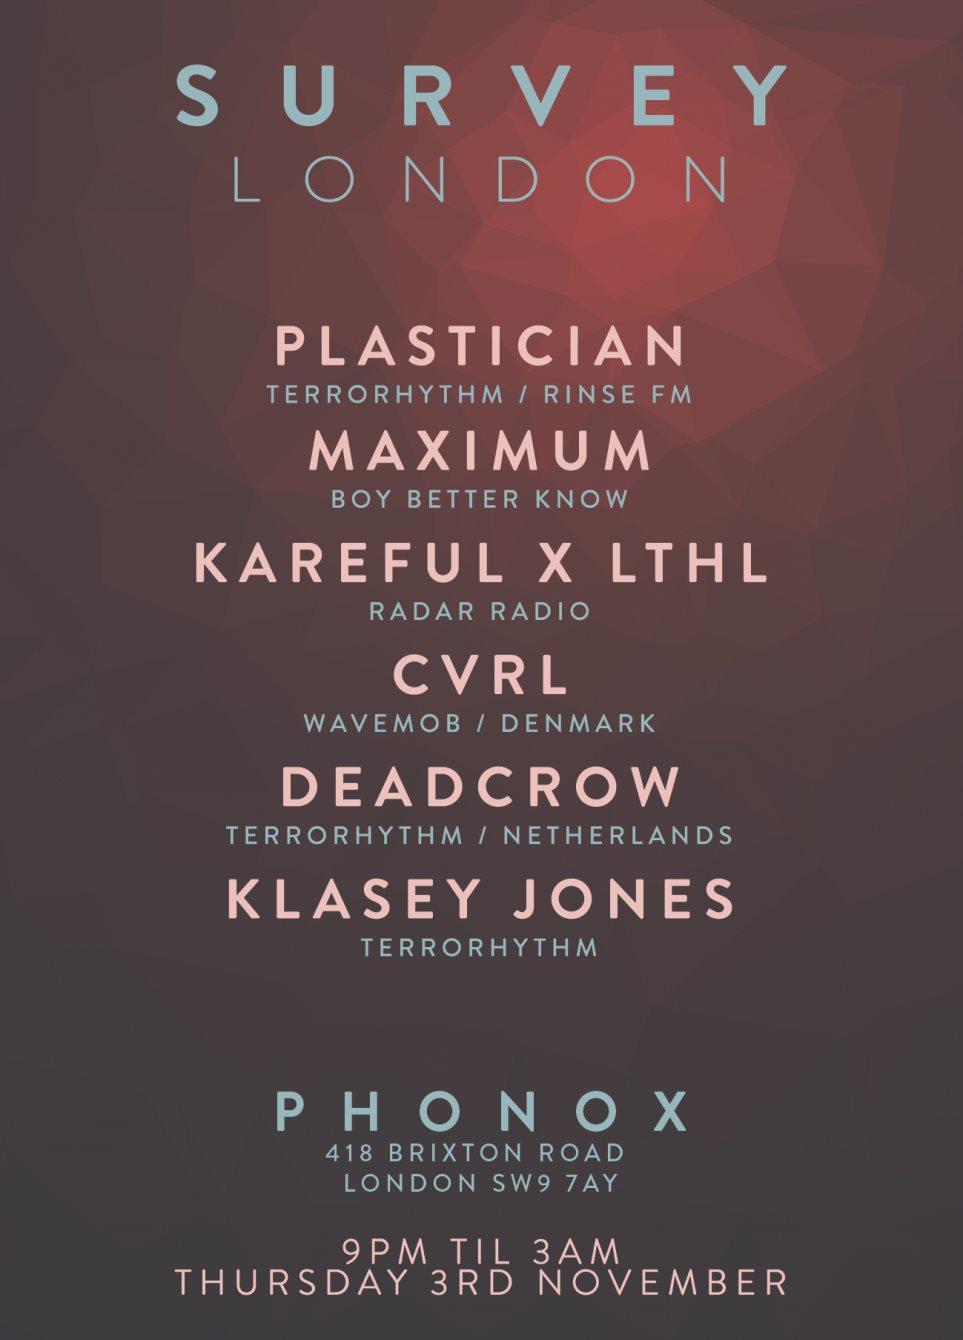 Survey London - November 2016 with Plastician, DJ Maximum, Kareful & More - Flyer front